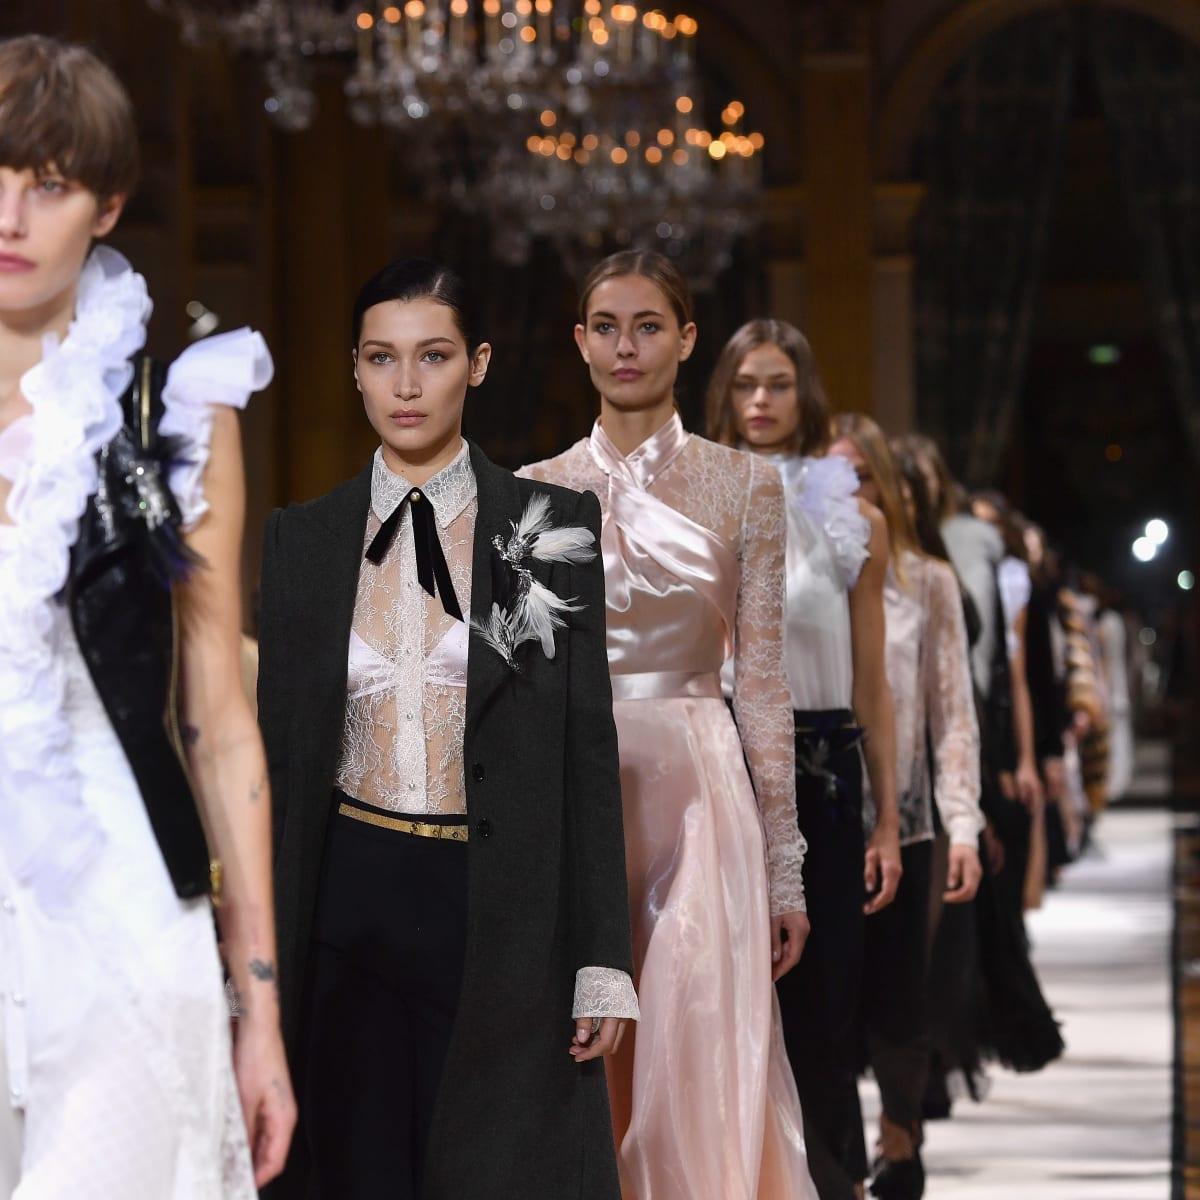 Lanvin Sales Continue to Slump After Firing Alber Elbaz - Fashionista